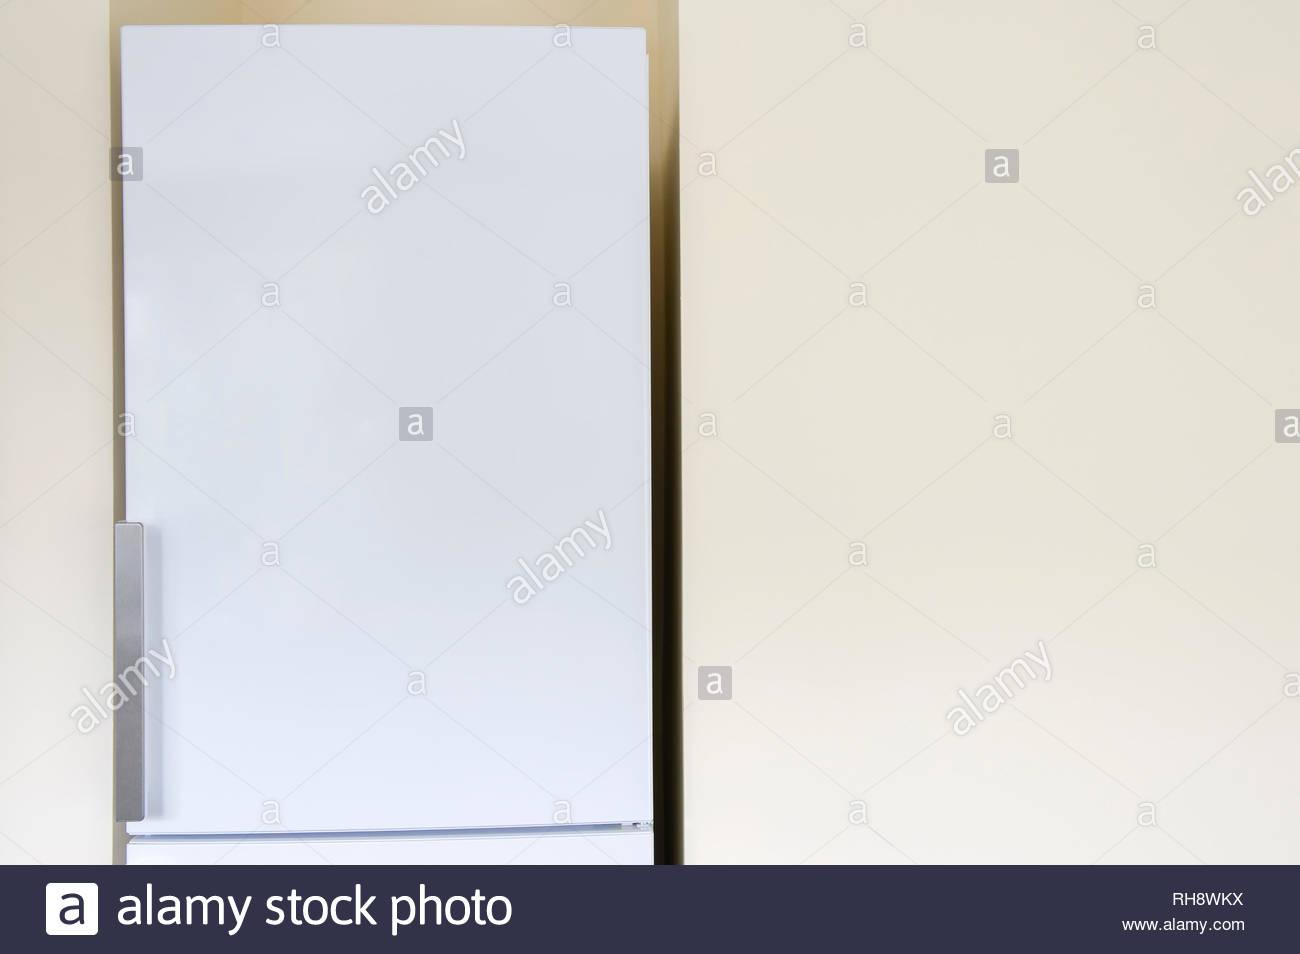 Fridge next to blank kitchen wall - Stock Image